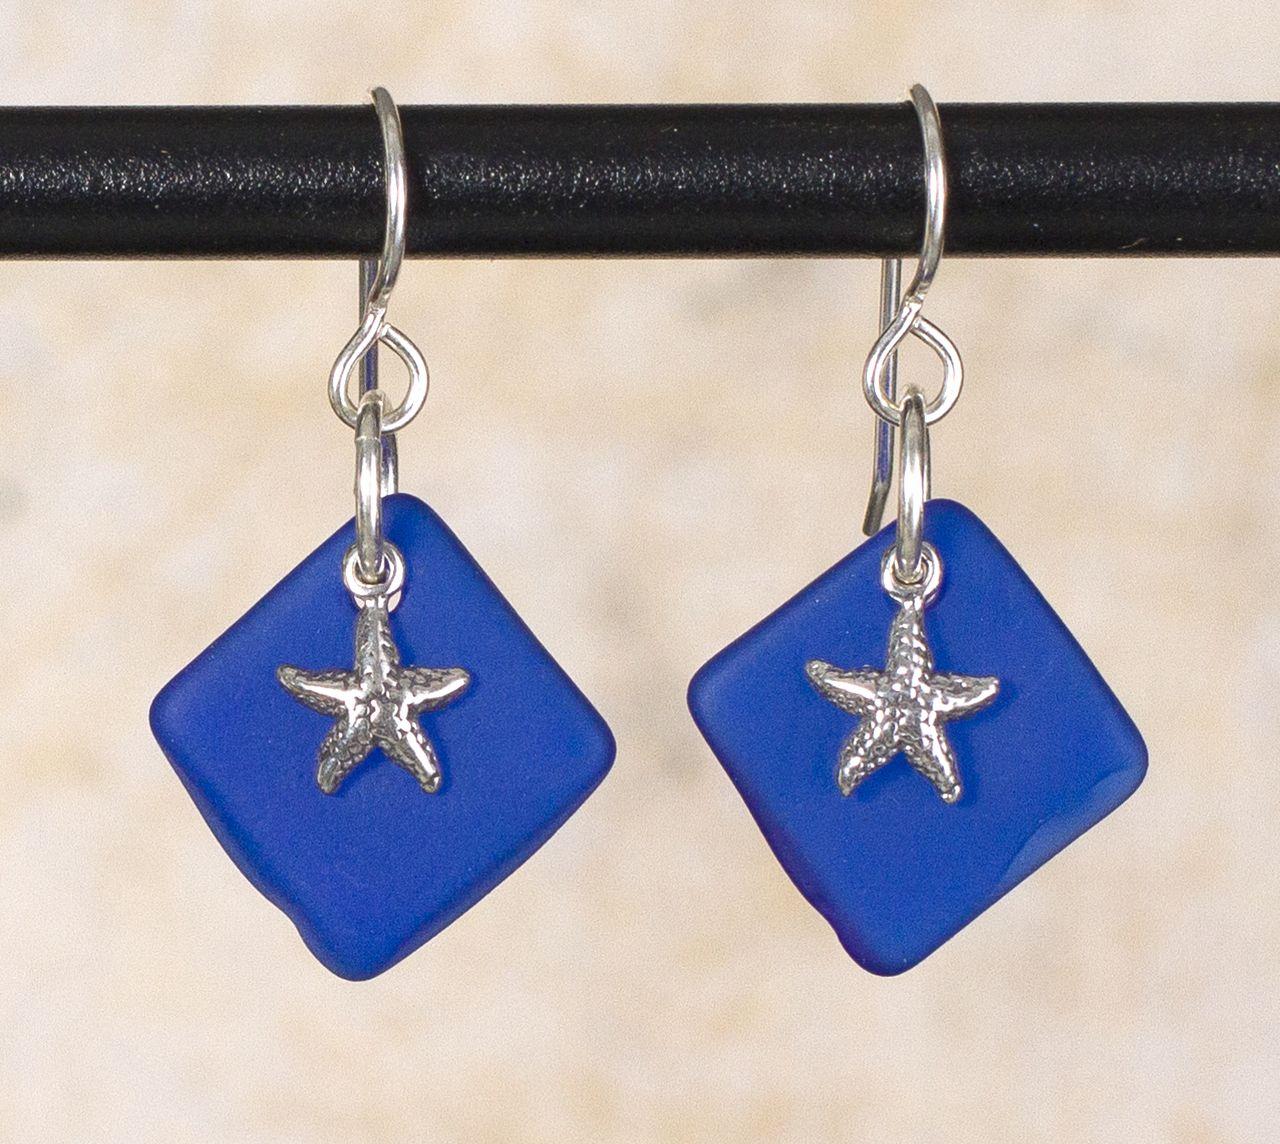 Home design bilder einzigen stock seaglass starfish charm earrings  a a wonderful sea glass beach